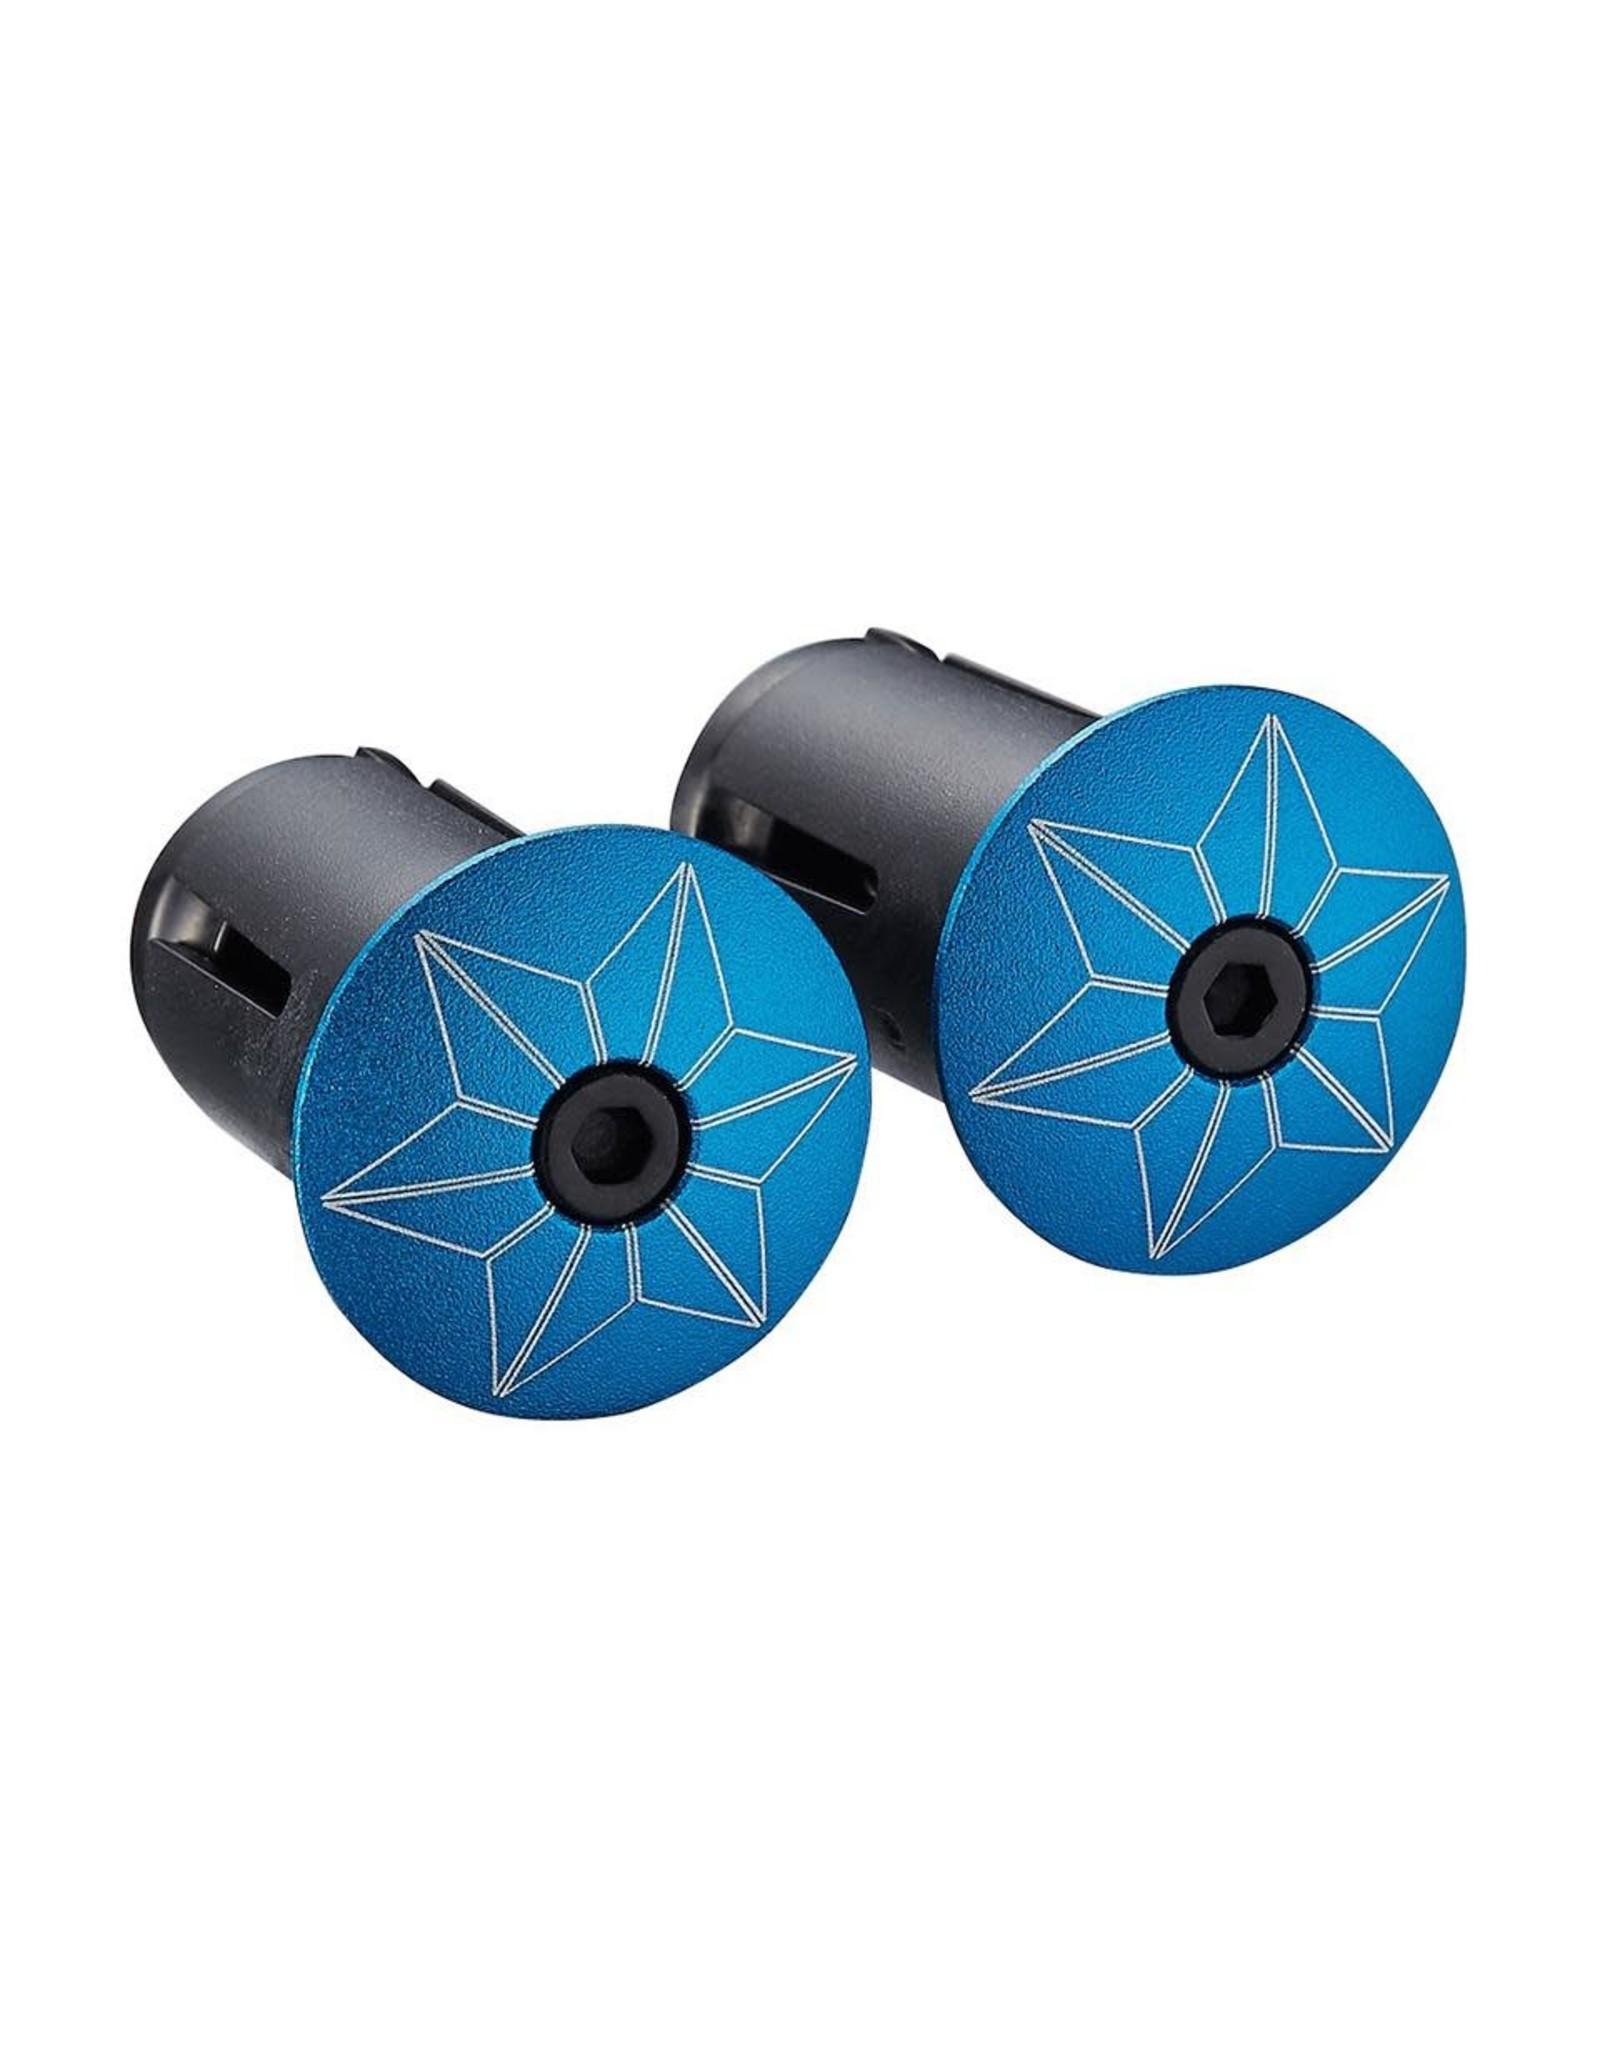 Supacaz Bling Blue Ano/Blue ano plugs Bar Tape